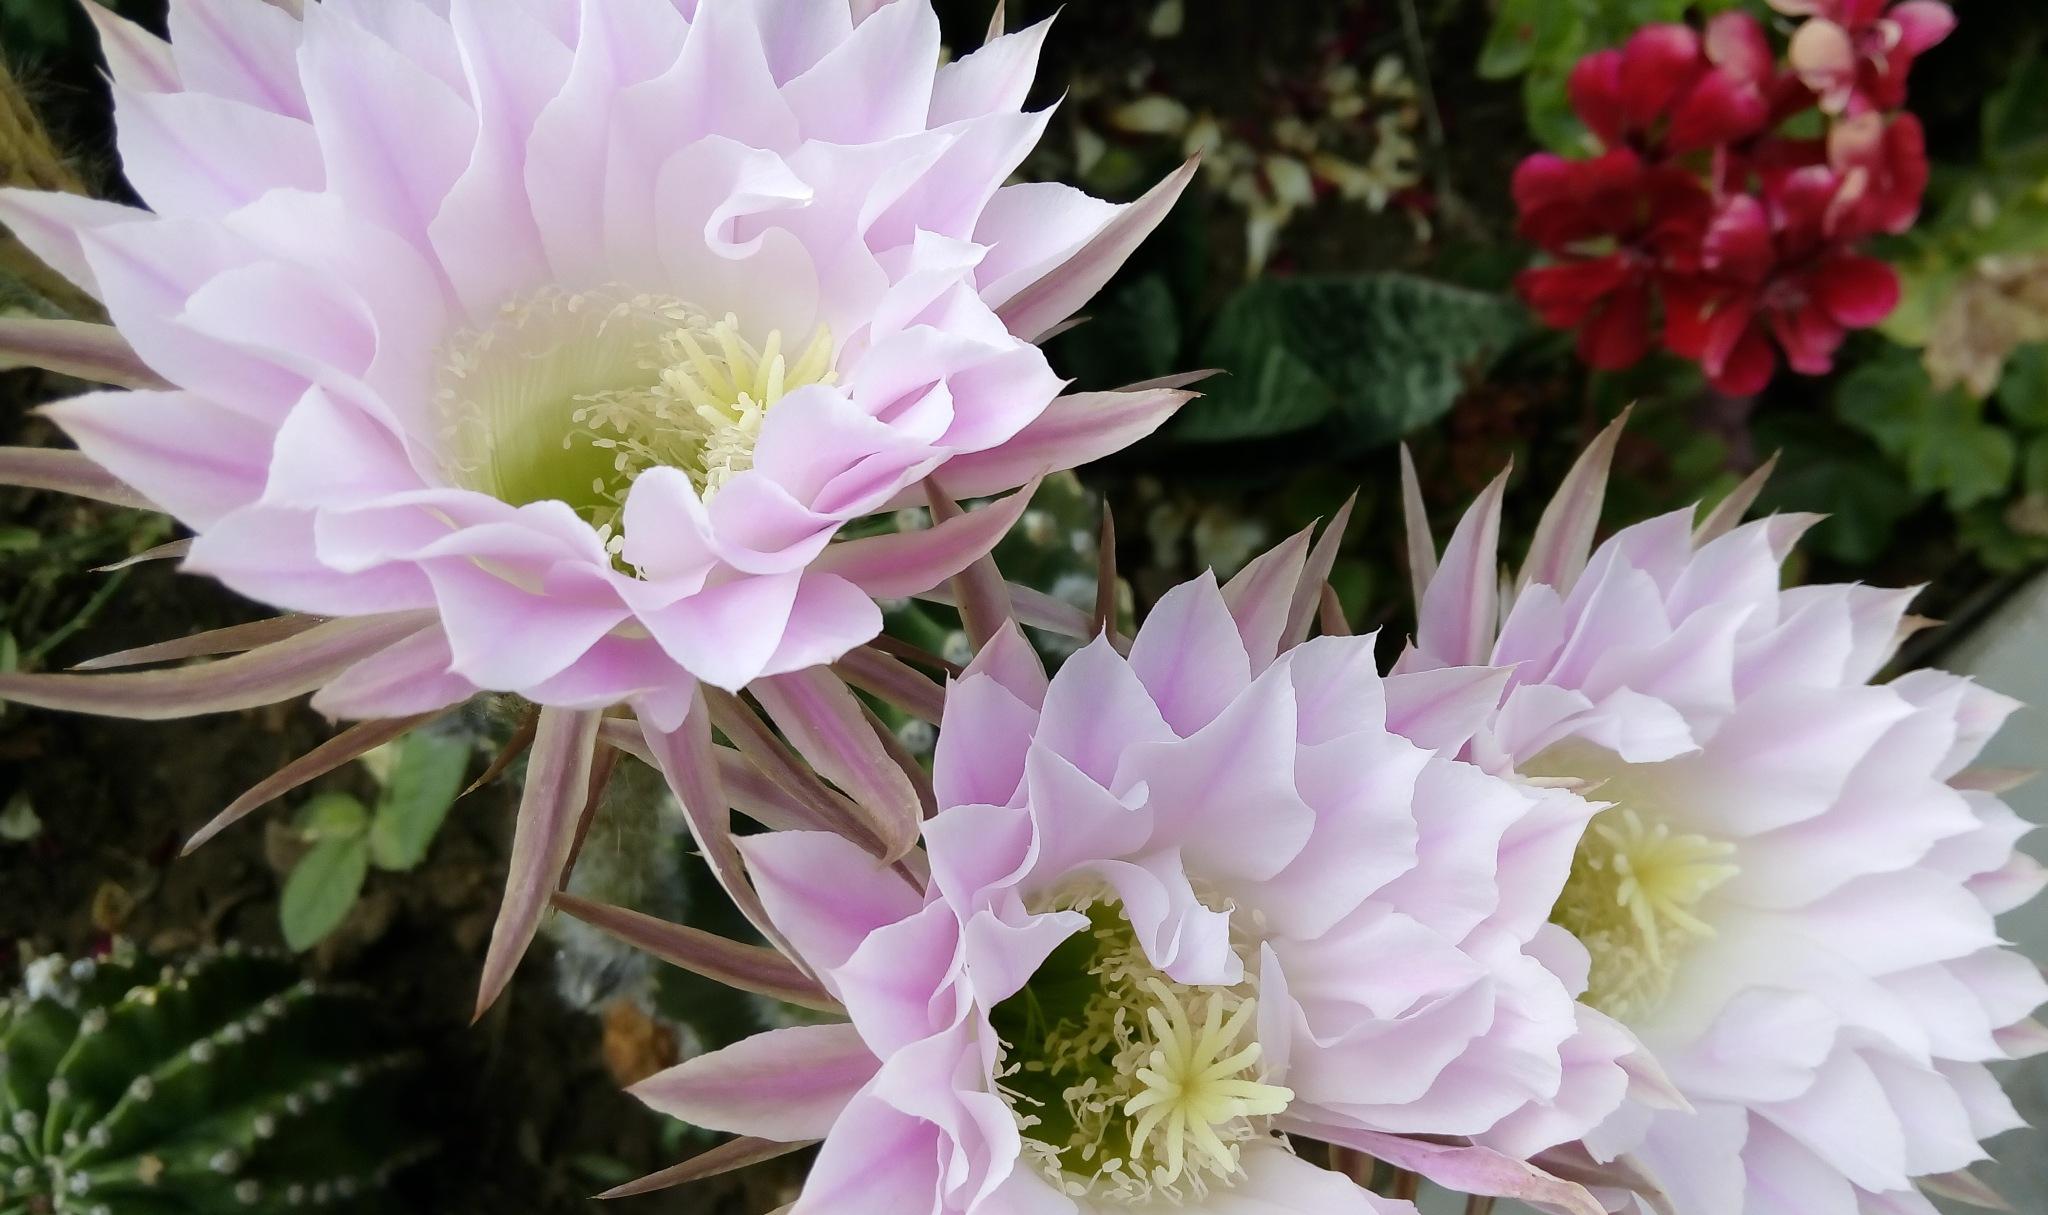 Cactus flowers by Nenad Tasic